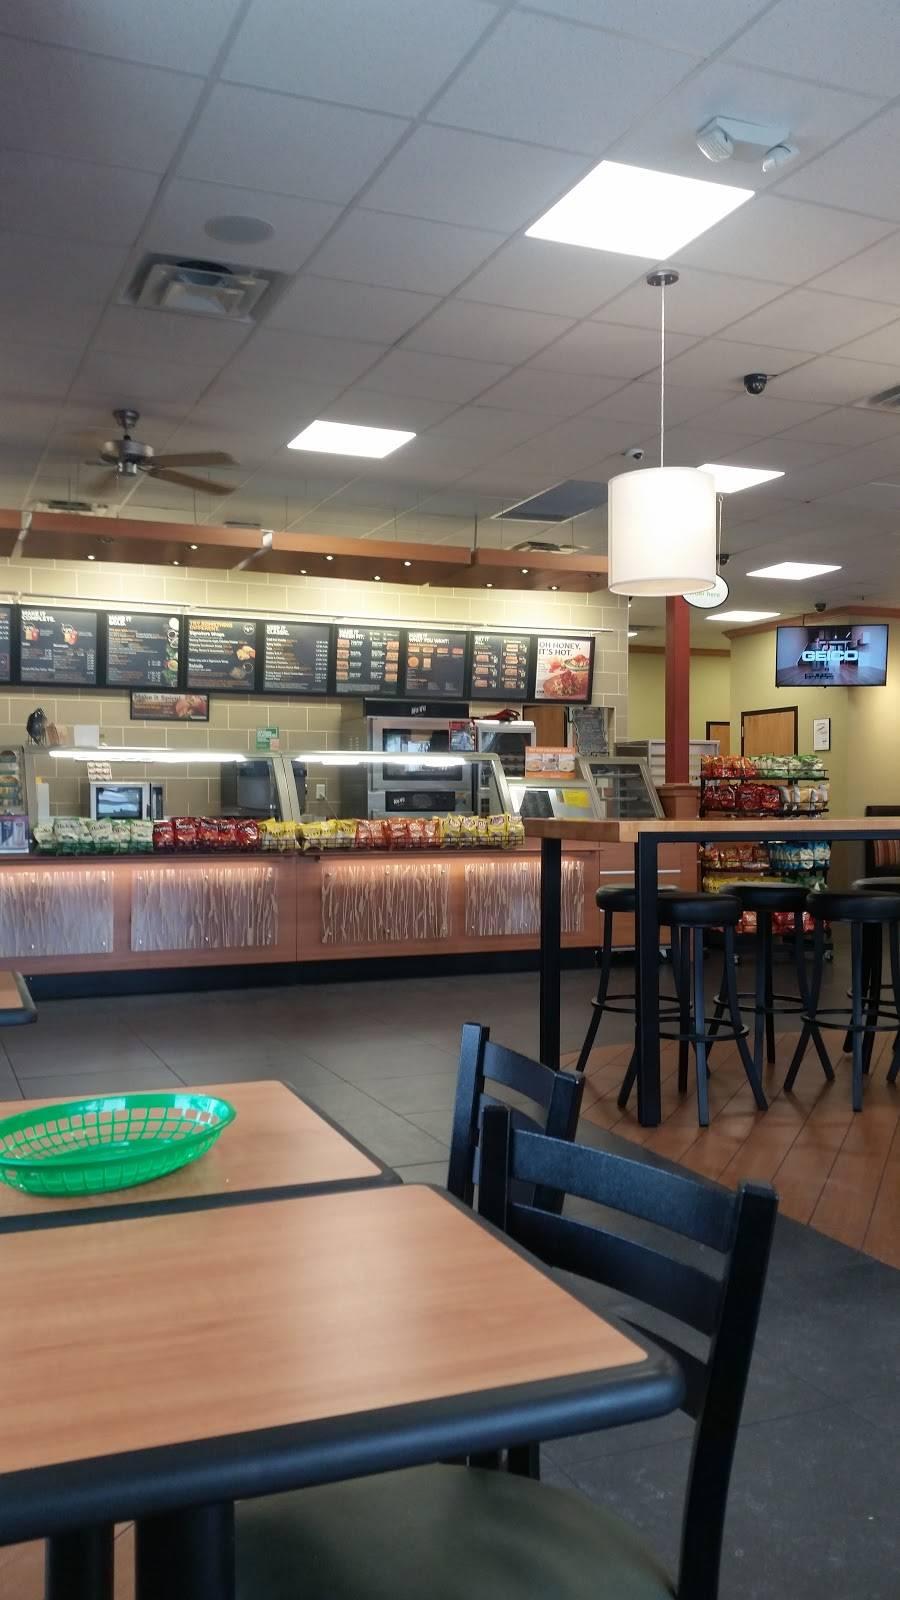 Subway - meal takeaway  | Photo 5 of 7 | Address: 6351, 402 S Desert Blvd Building D Suite 401, El Paso, TX 79932, USA | Phone: (915) 307-6135